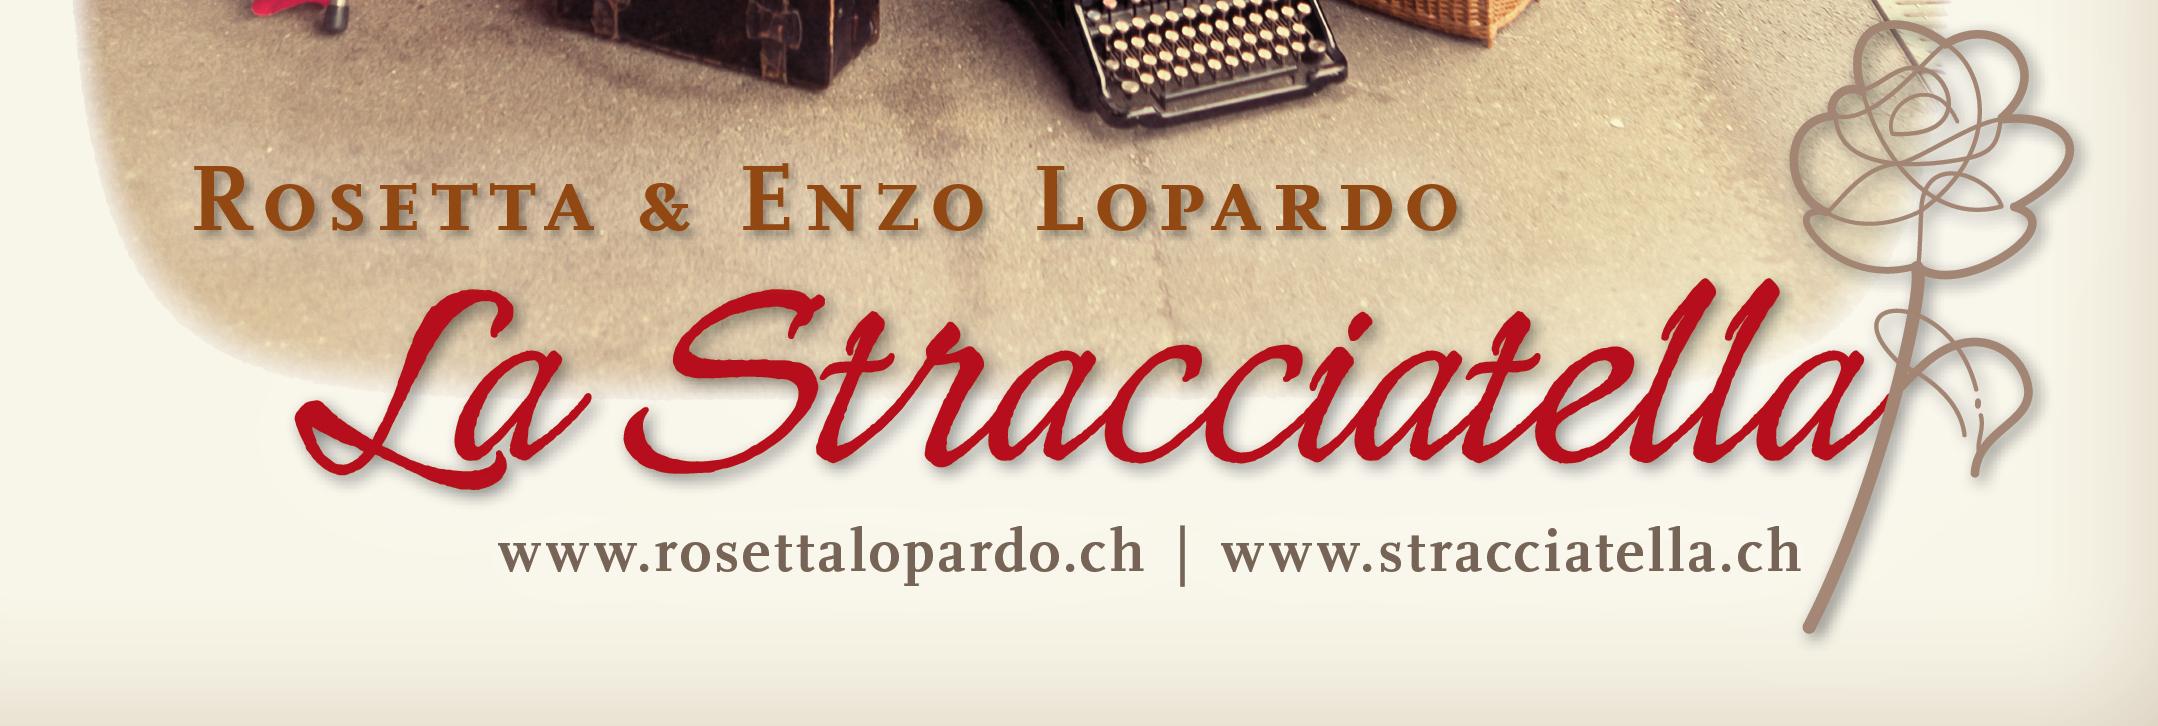 STR_plakat_0811_press2.jpg